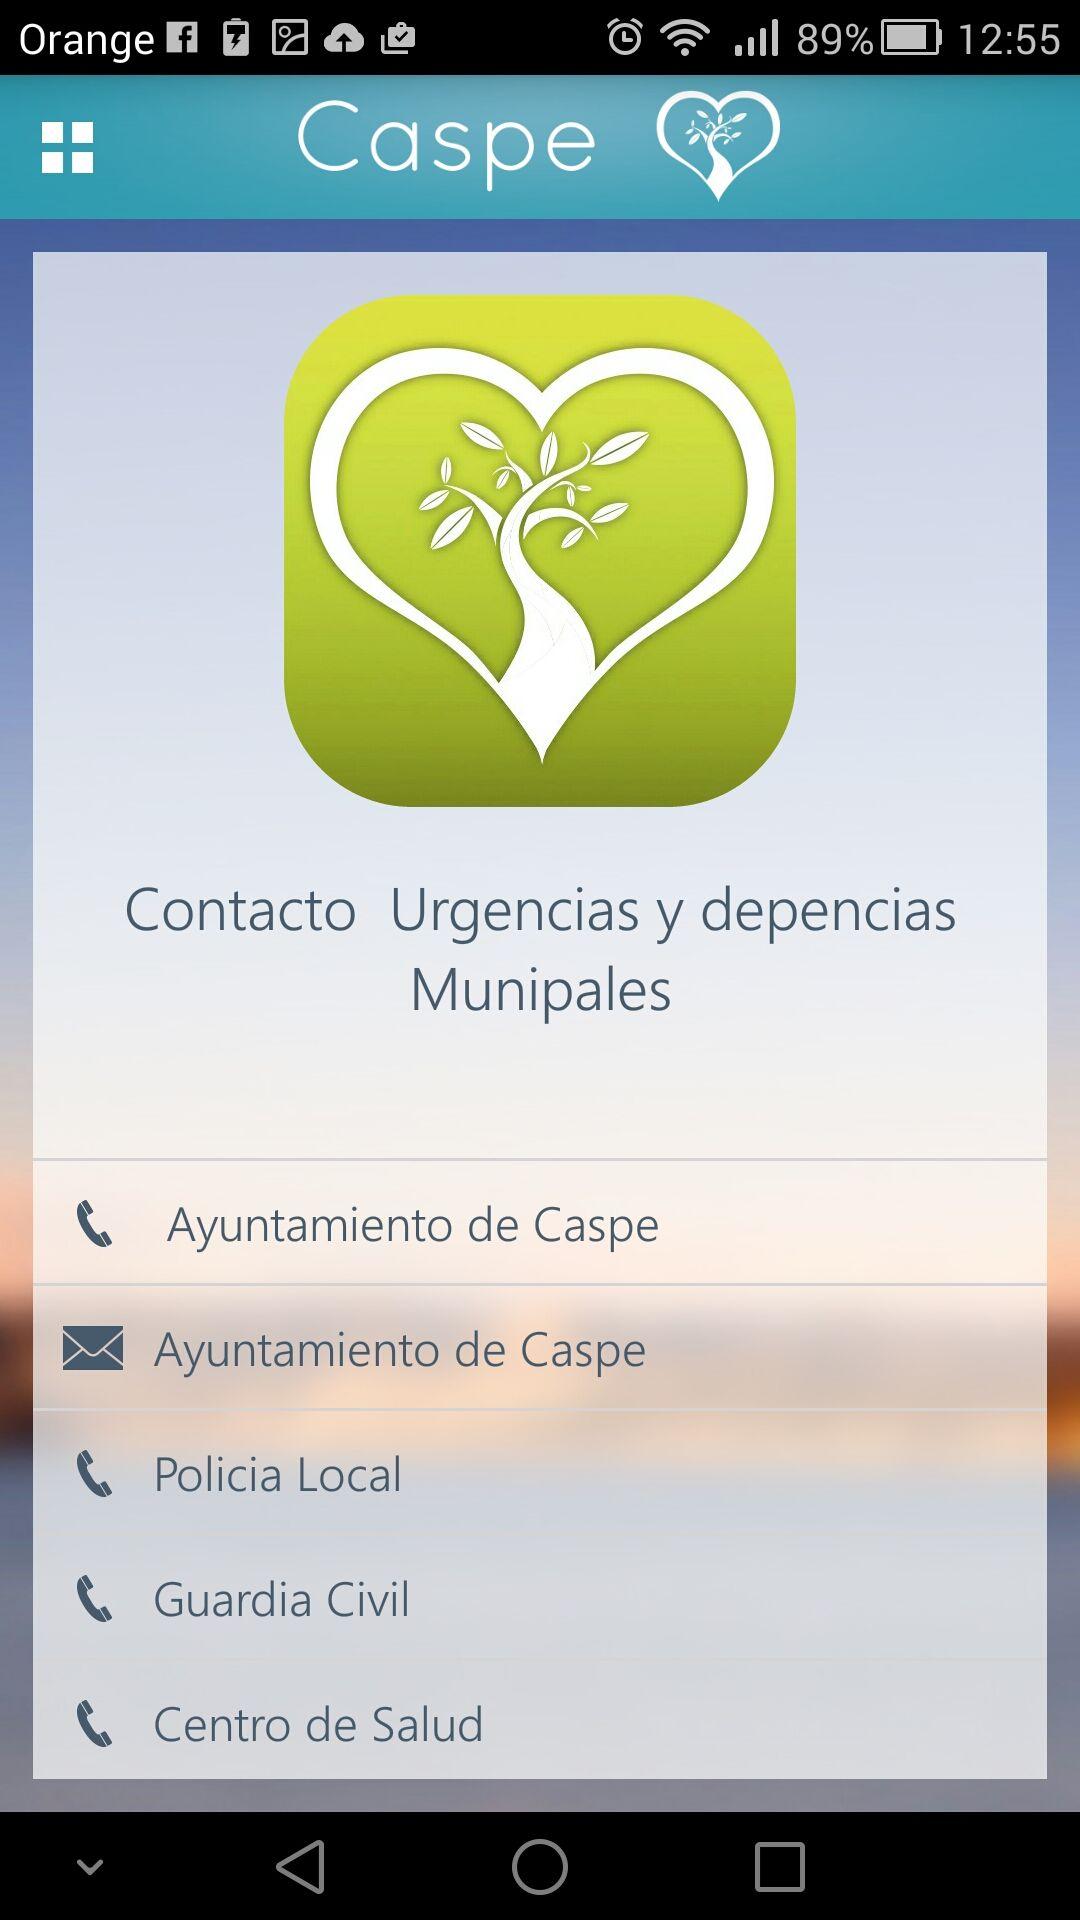 pantallazo_app_caspe_entu_bolsillo_08